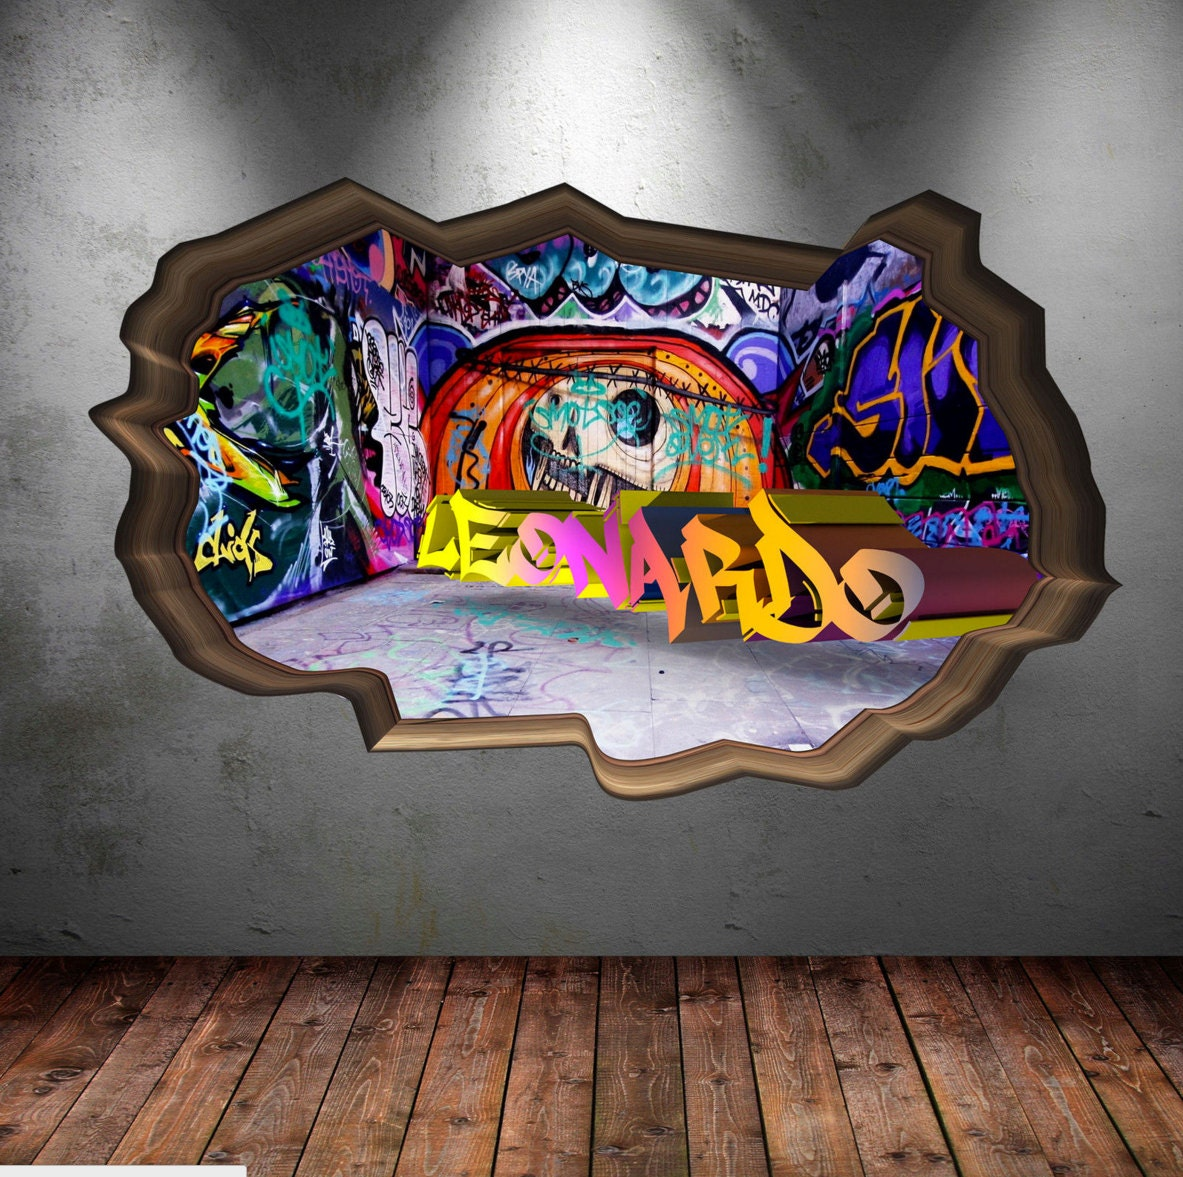 Bedroom Wall Art Graffiti: Personalised Name Full Colour Graffiti Wall Decals Cracked 3d